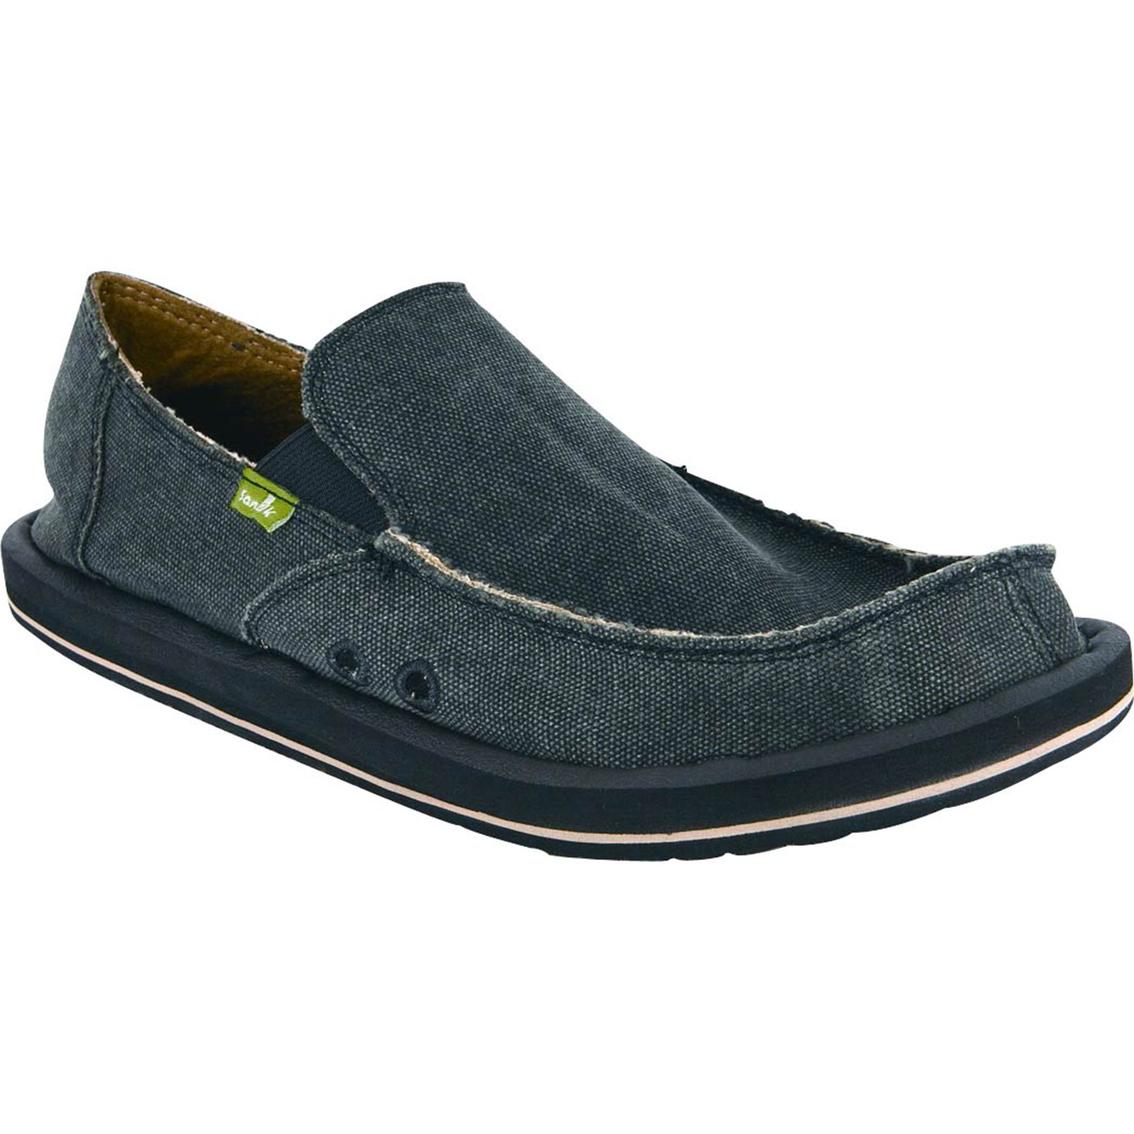 Sanuk Men's Vagabond Slip On Shoes